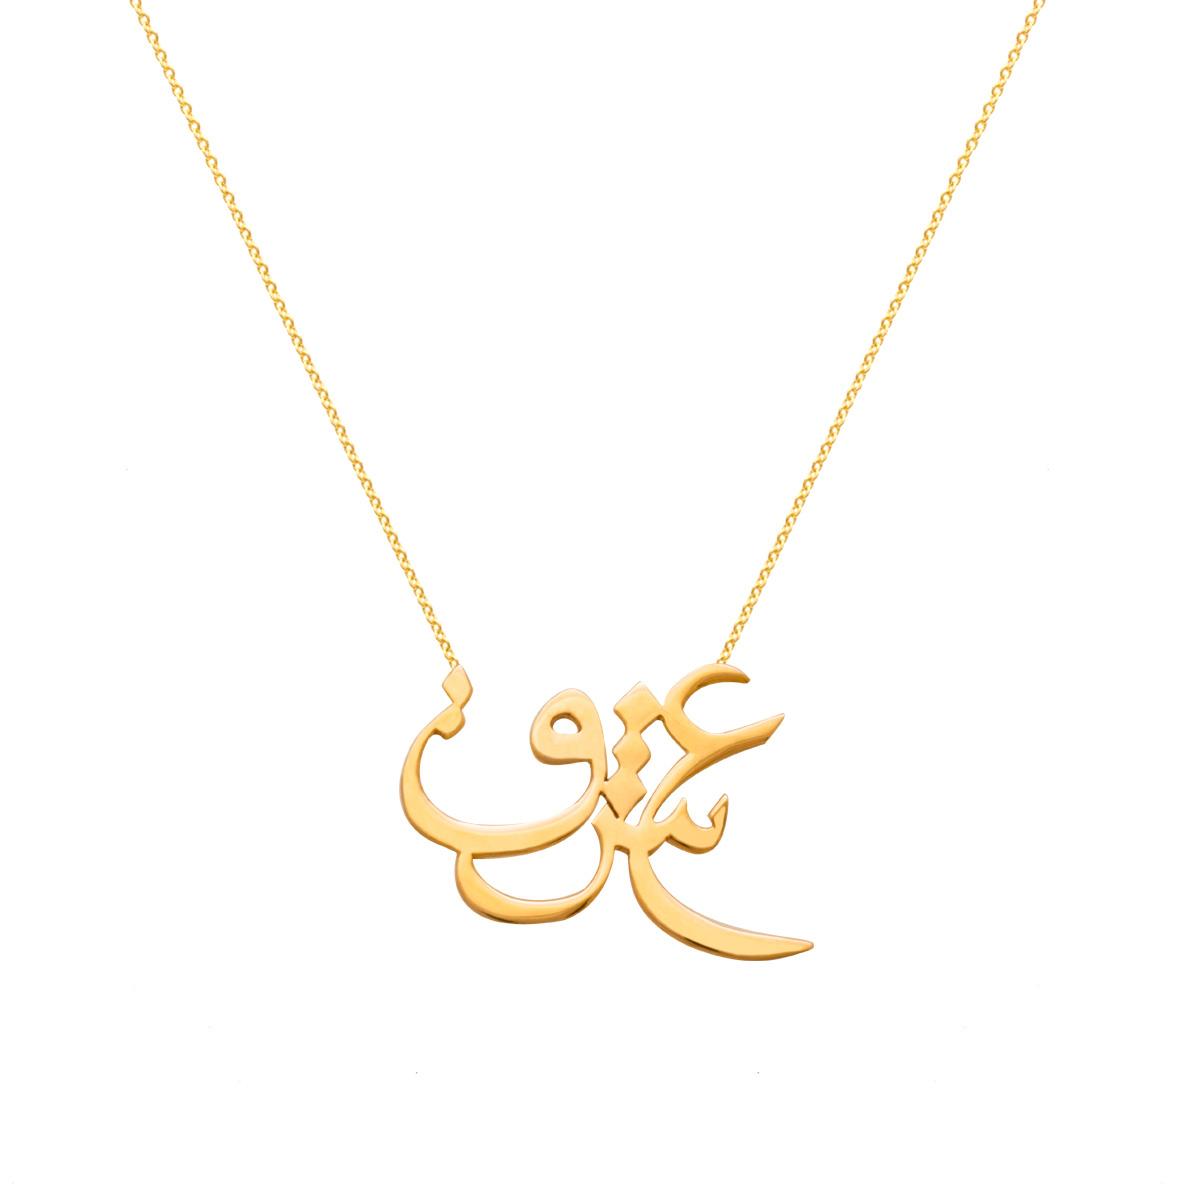 پرسته گردنبند طلا عشق بزرگ